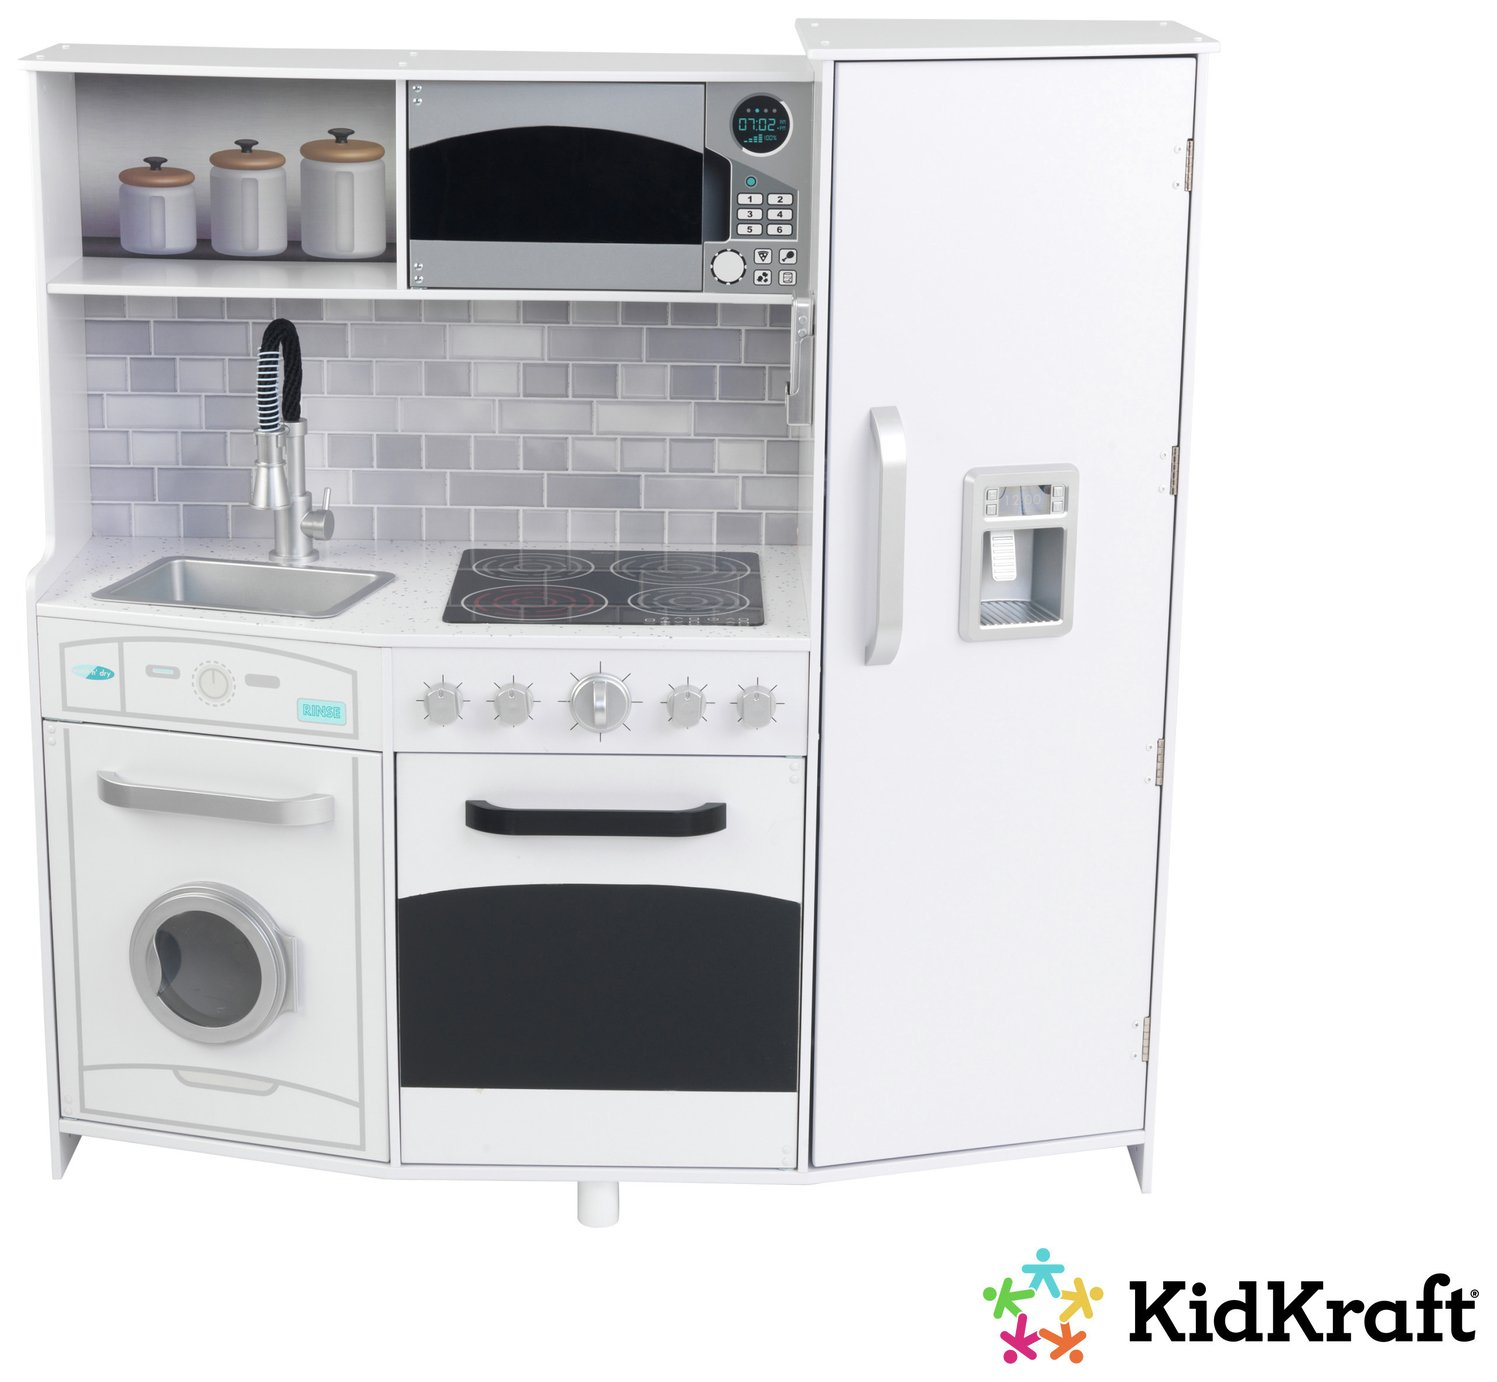 KidKraft Large Play Wooden Play Kitchen